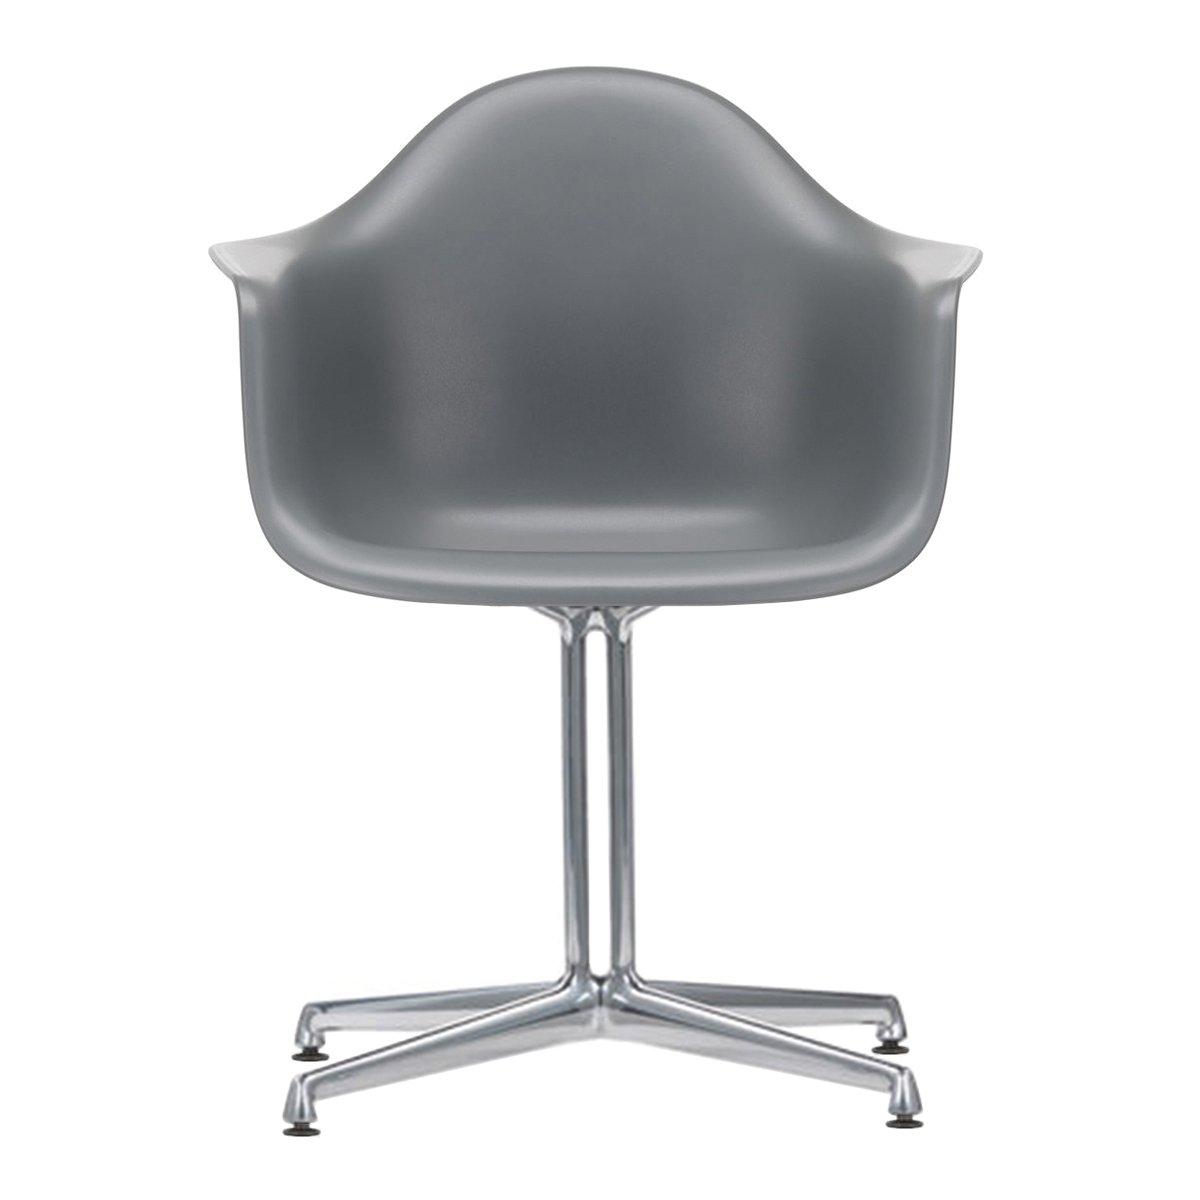 Vitra Eames Plastic Chair DAL Armstoel - Granite Grey